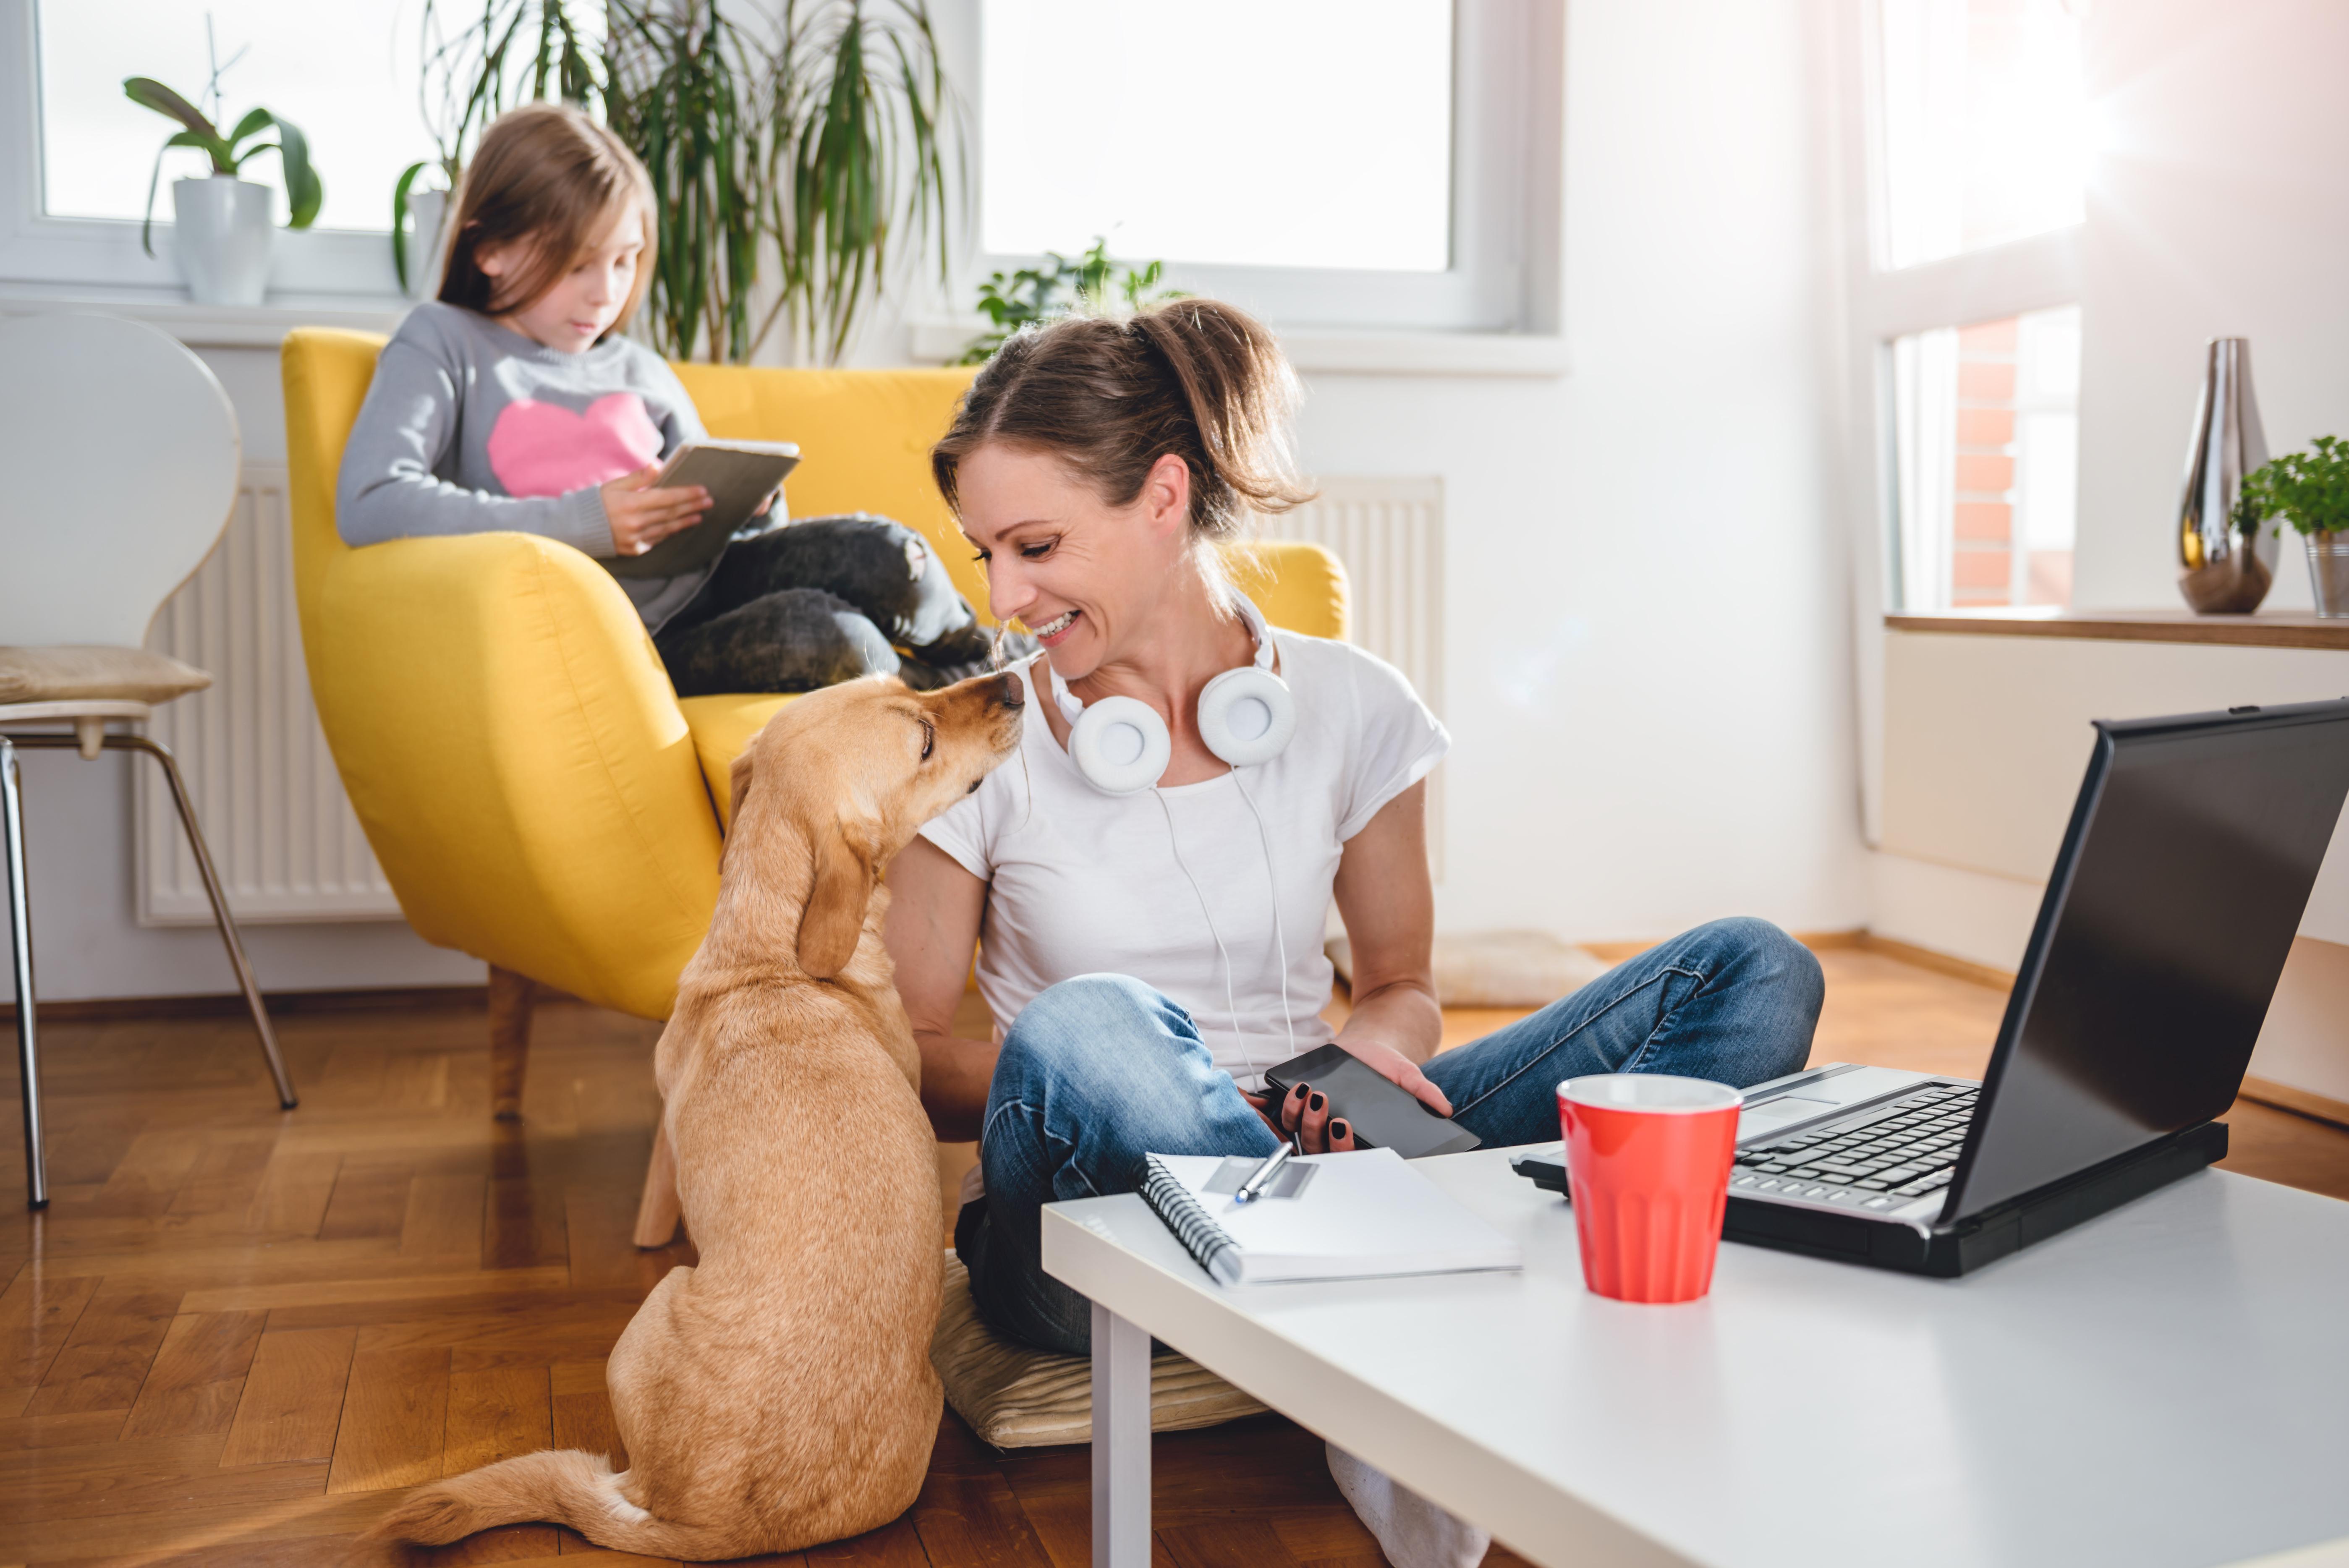 home office con niños coronavirus